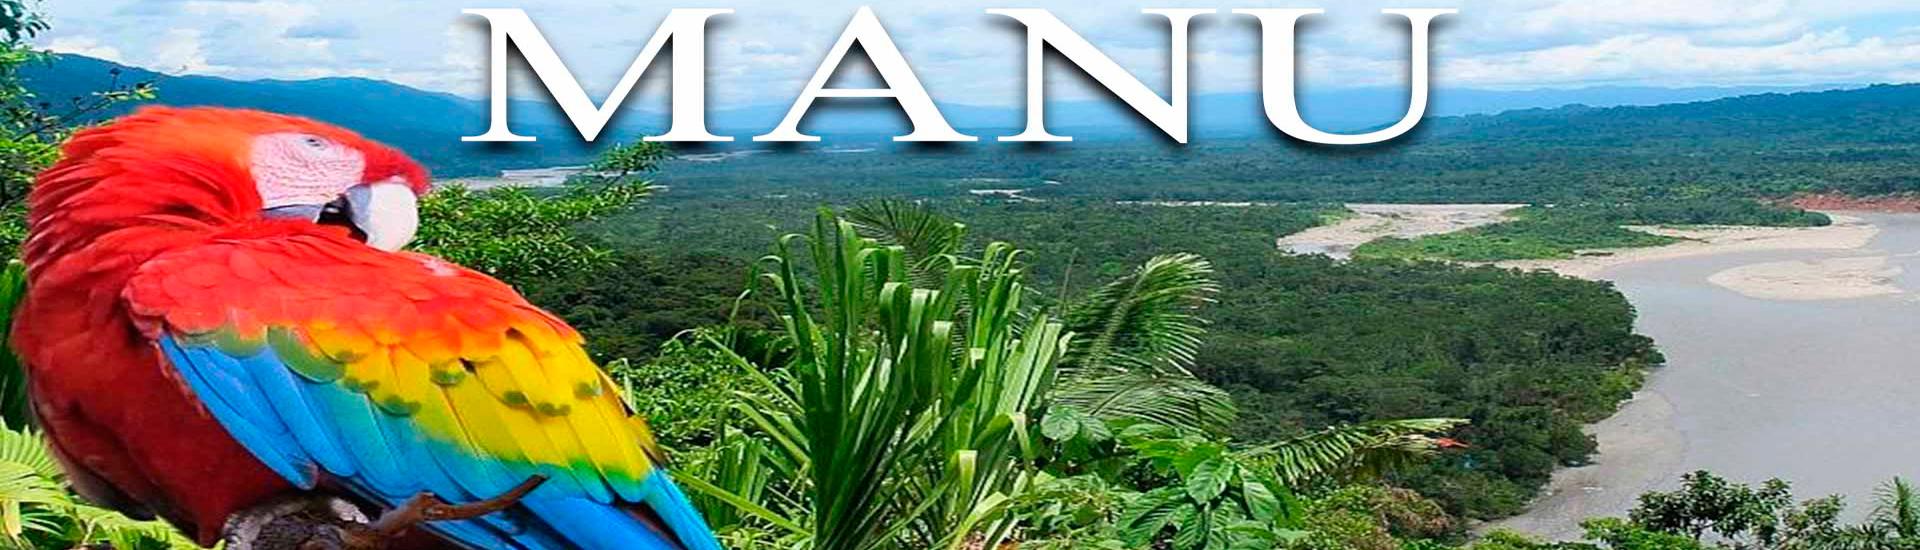 Manu National Park 05 Days / 04 Nights (Full adventure)